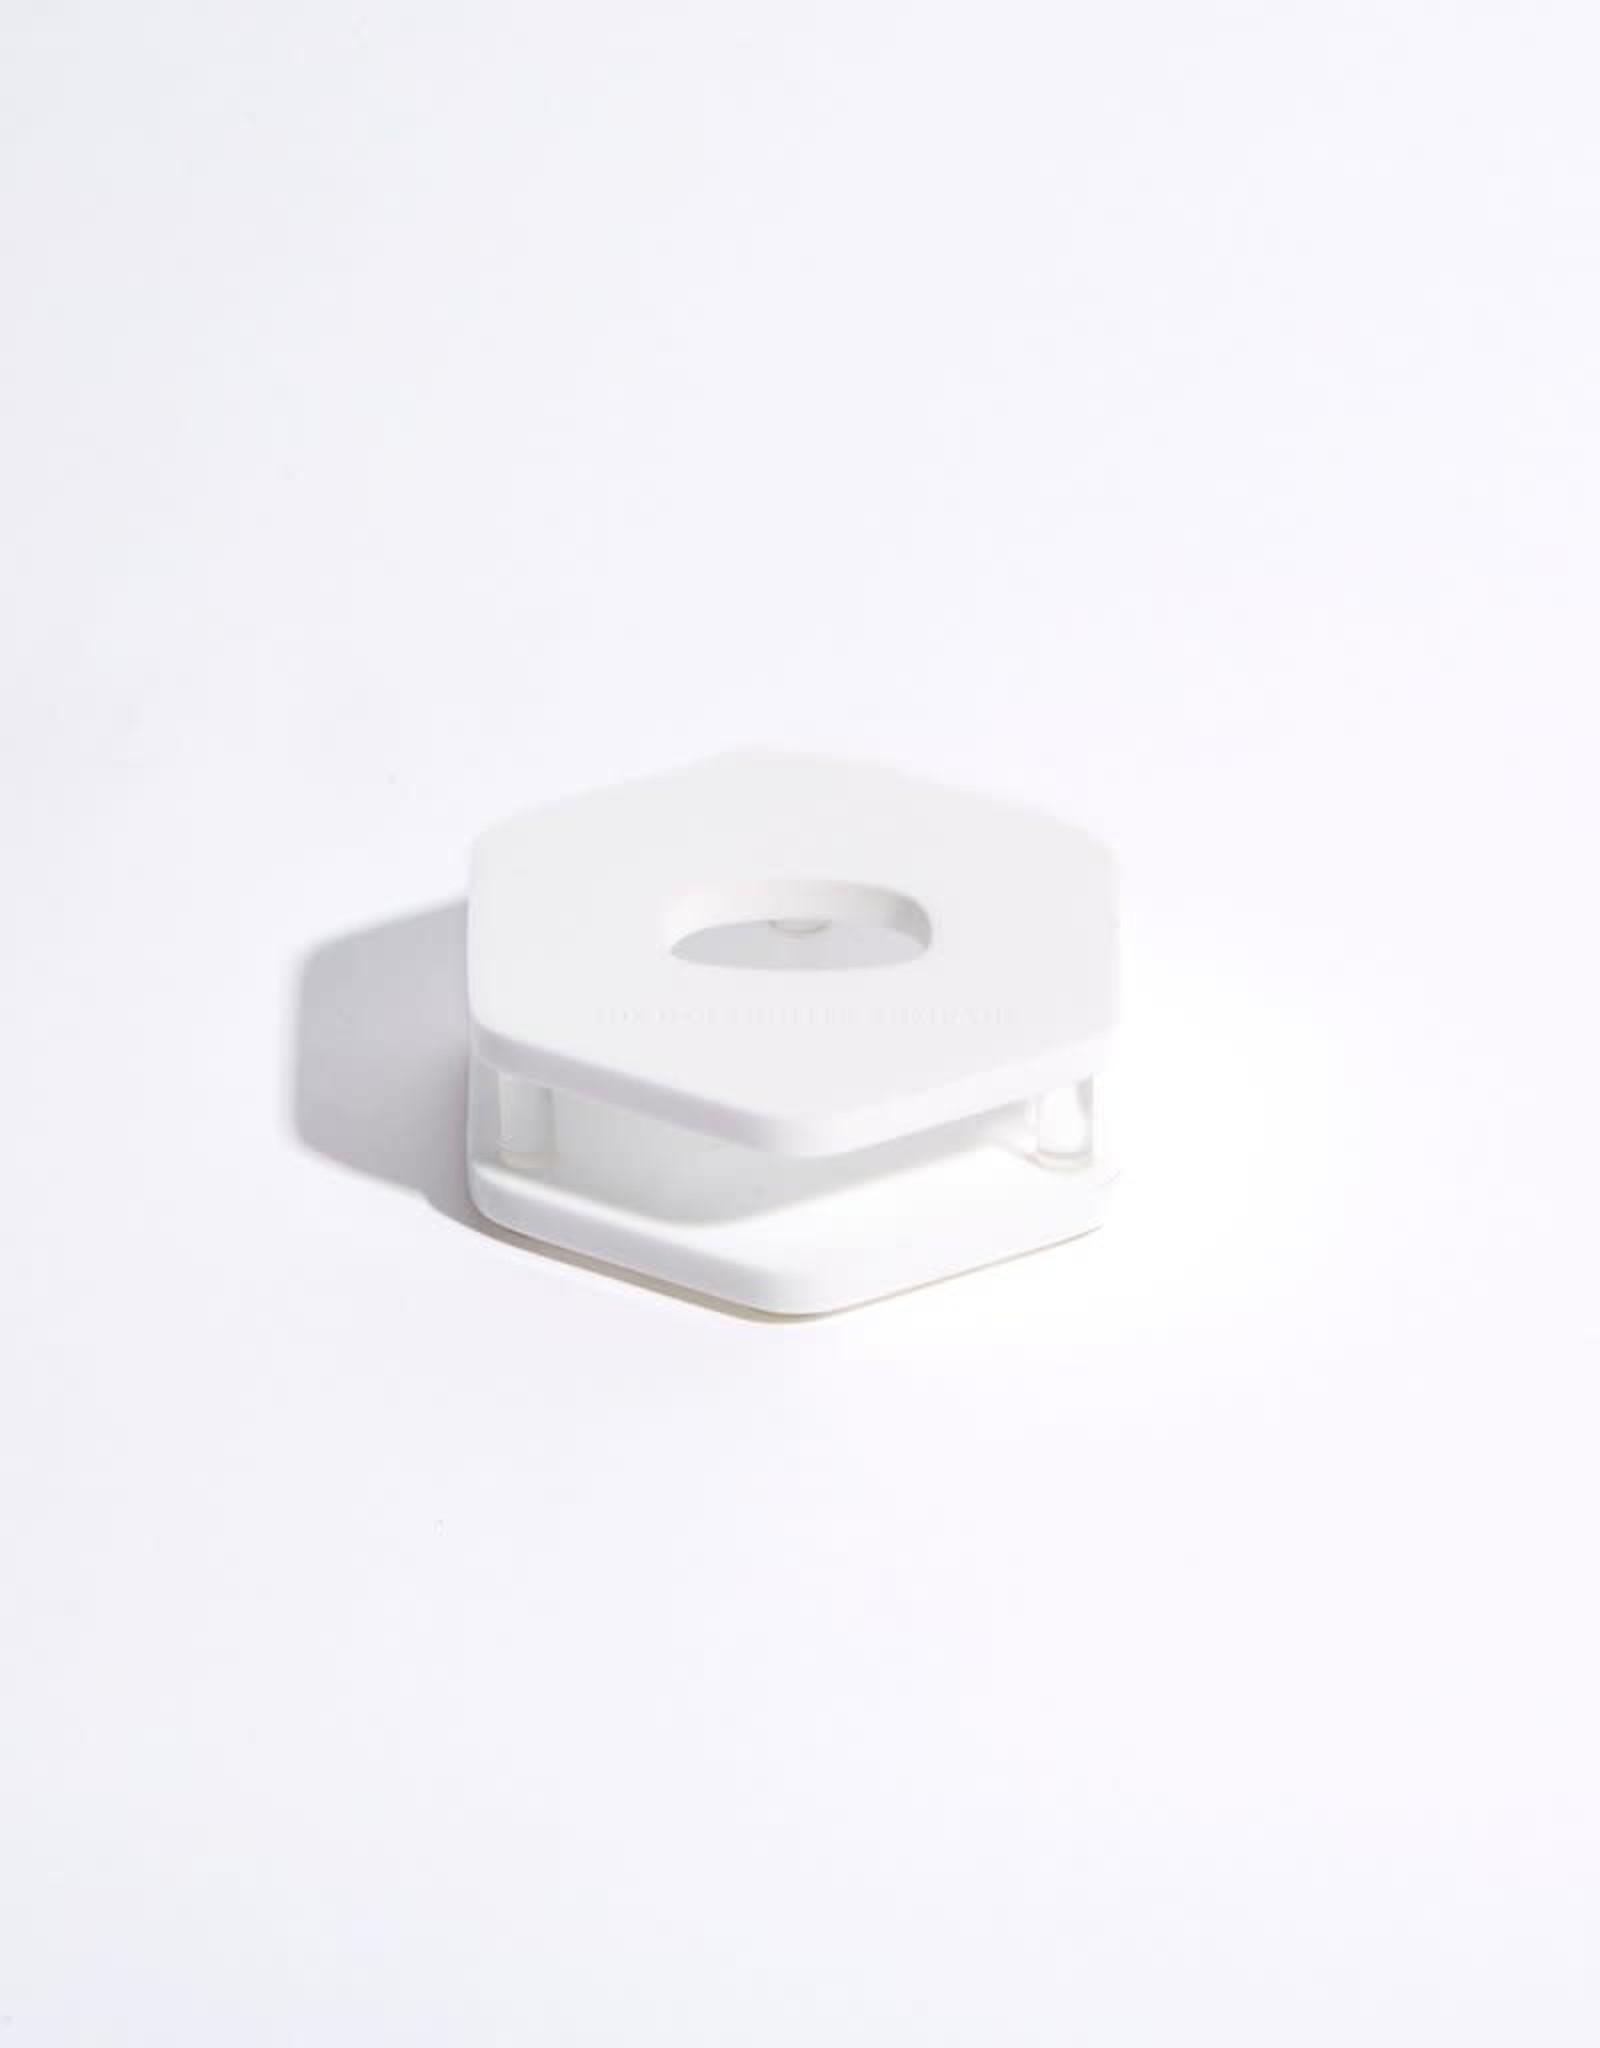 USB Lighter Company White USB Lighter Stand